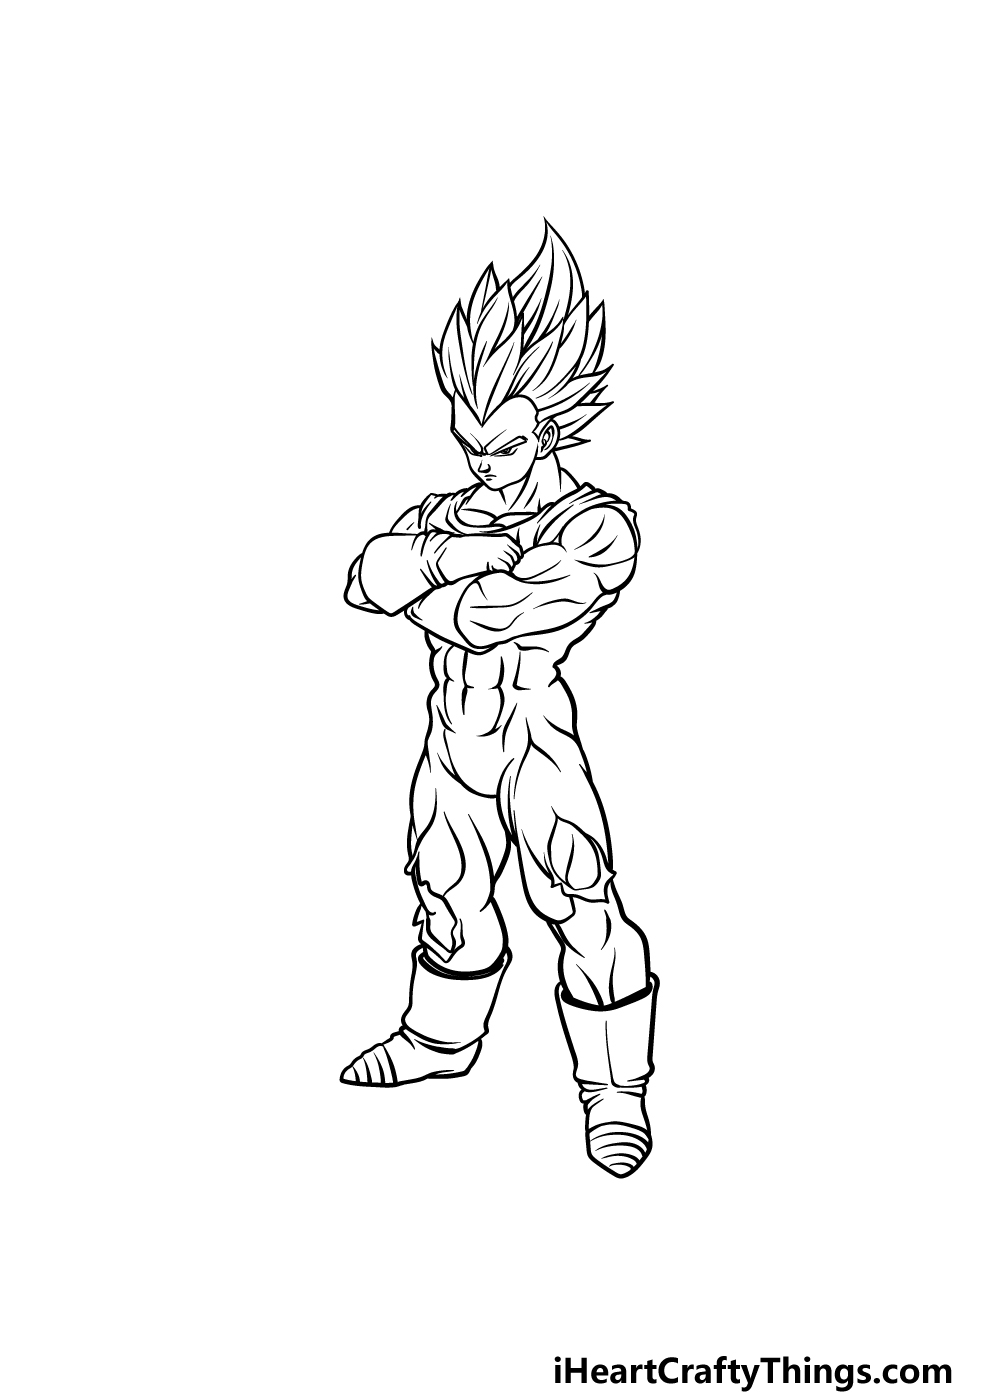 drawing Vegeta step 5